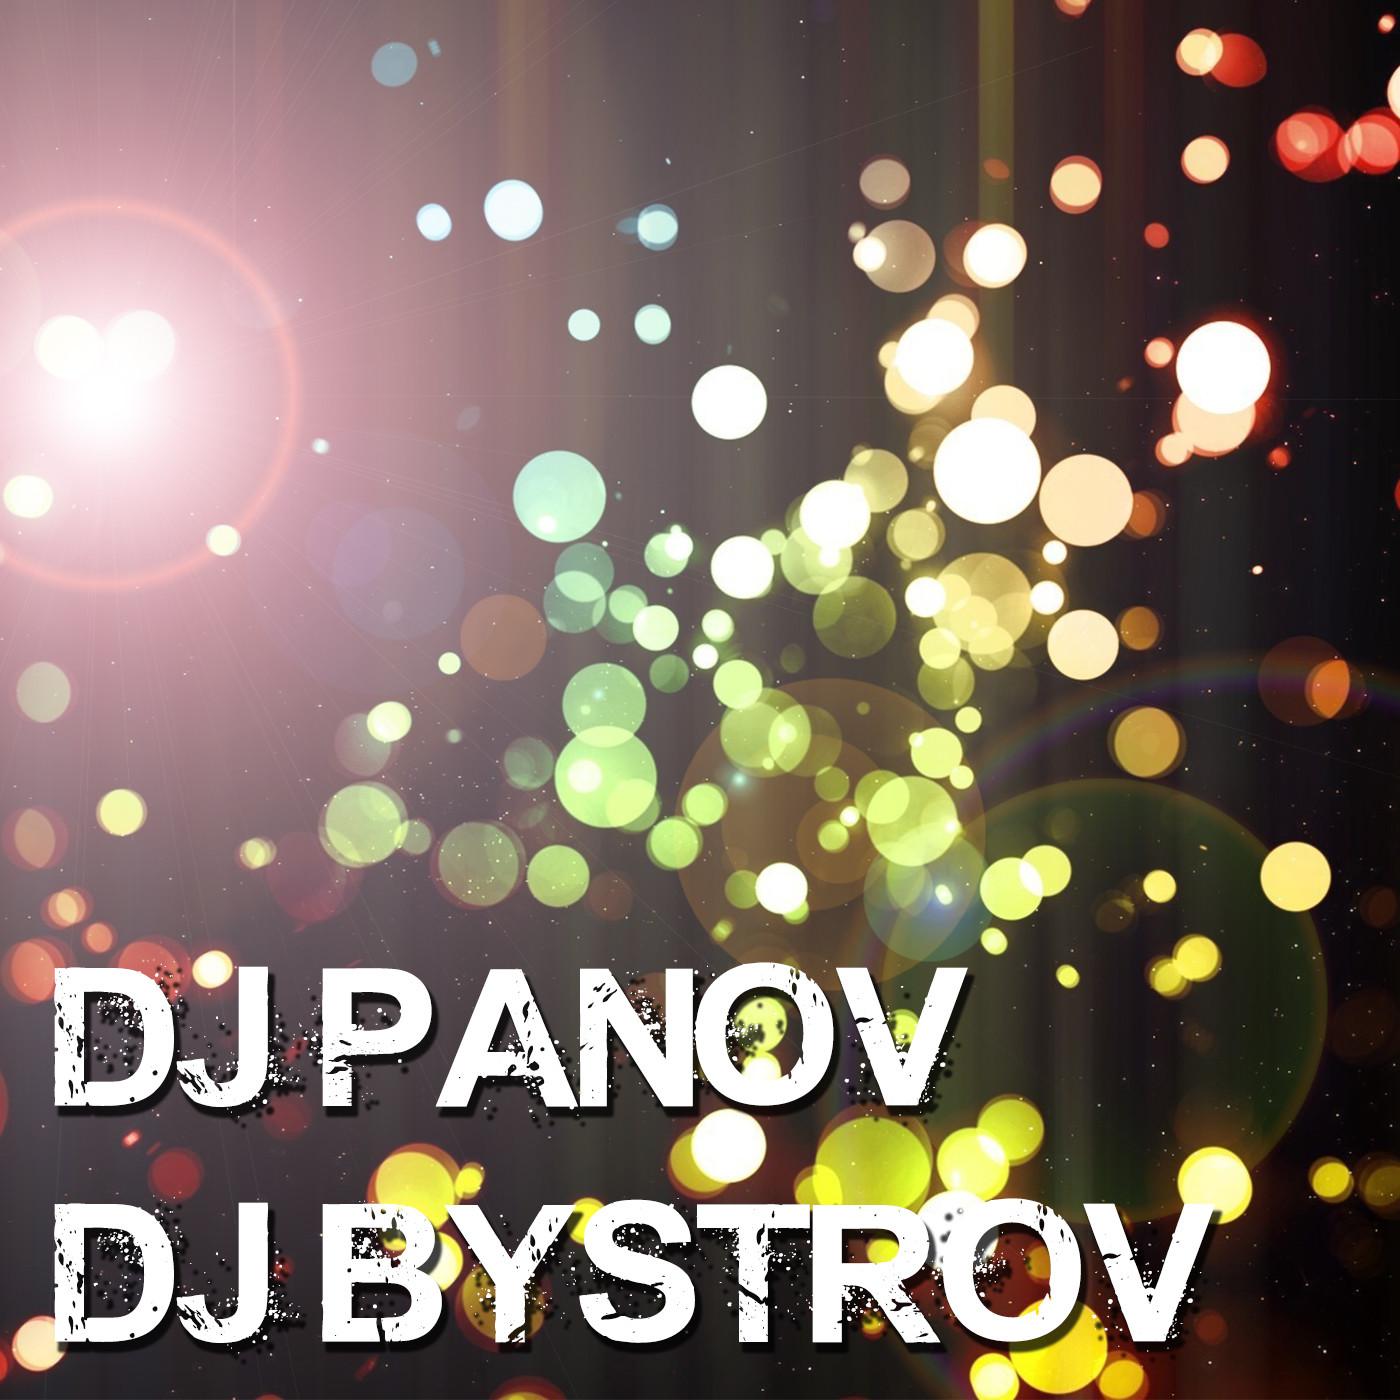 Panov & Bystrov